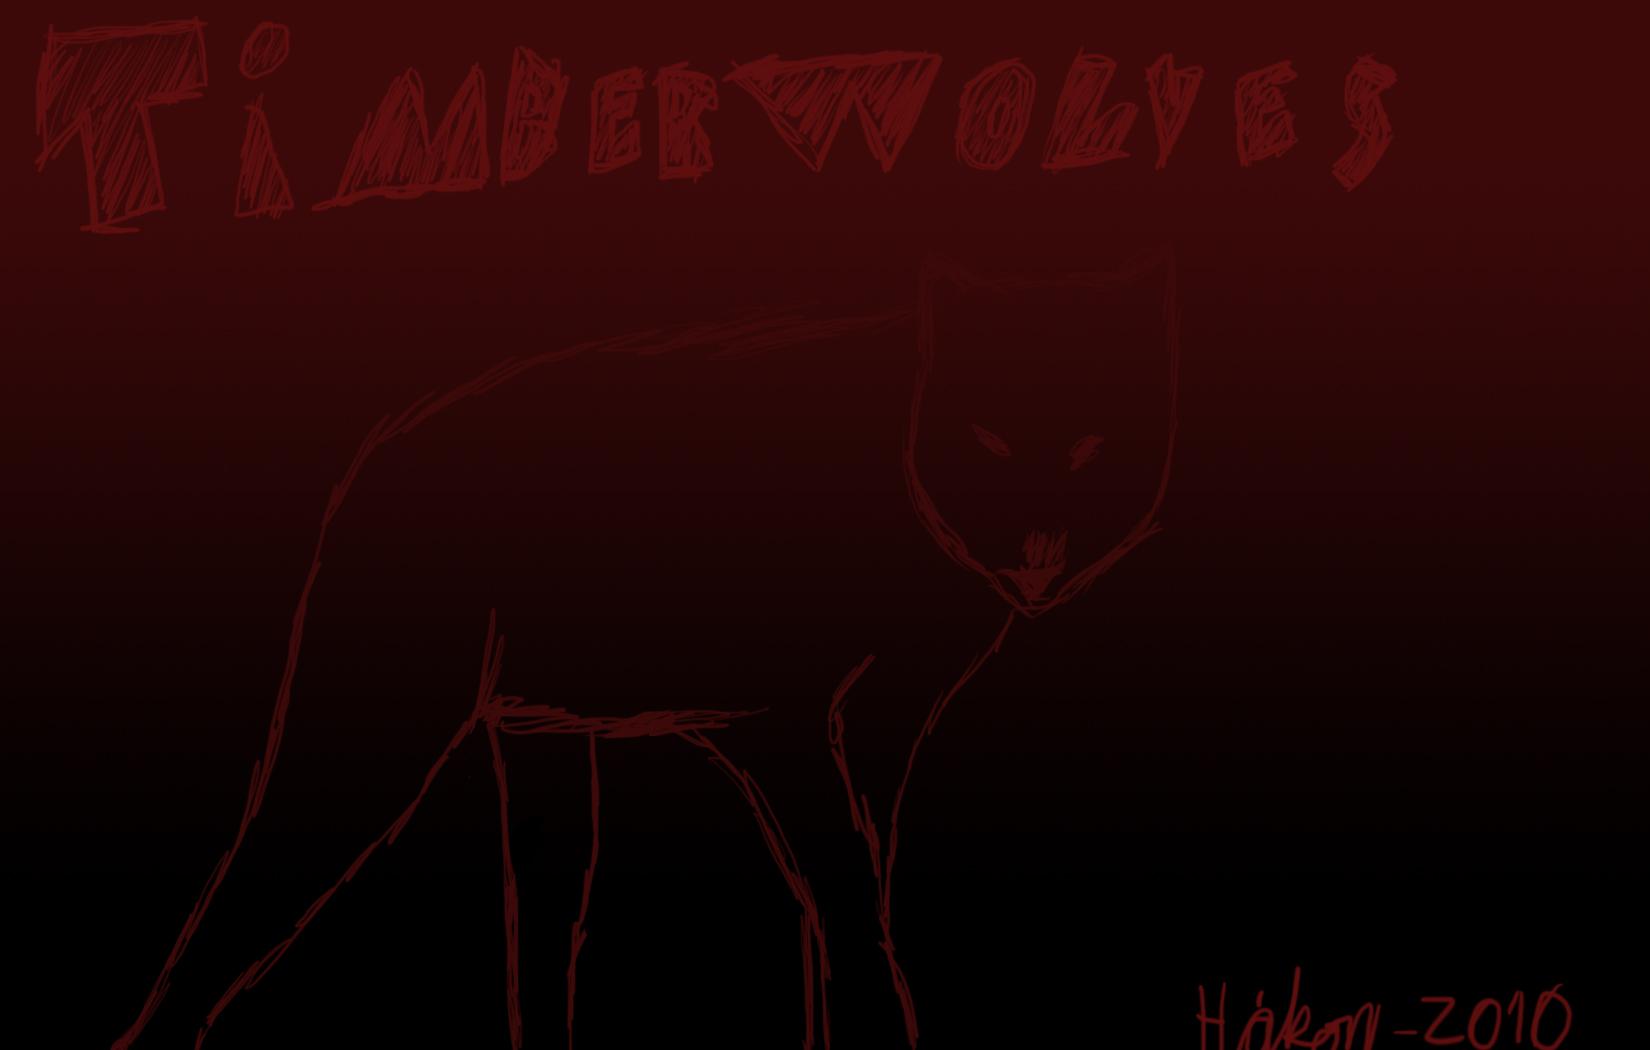 another timberwolves wallpaper